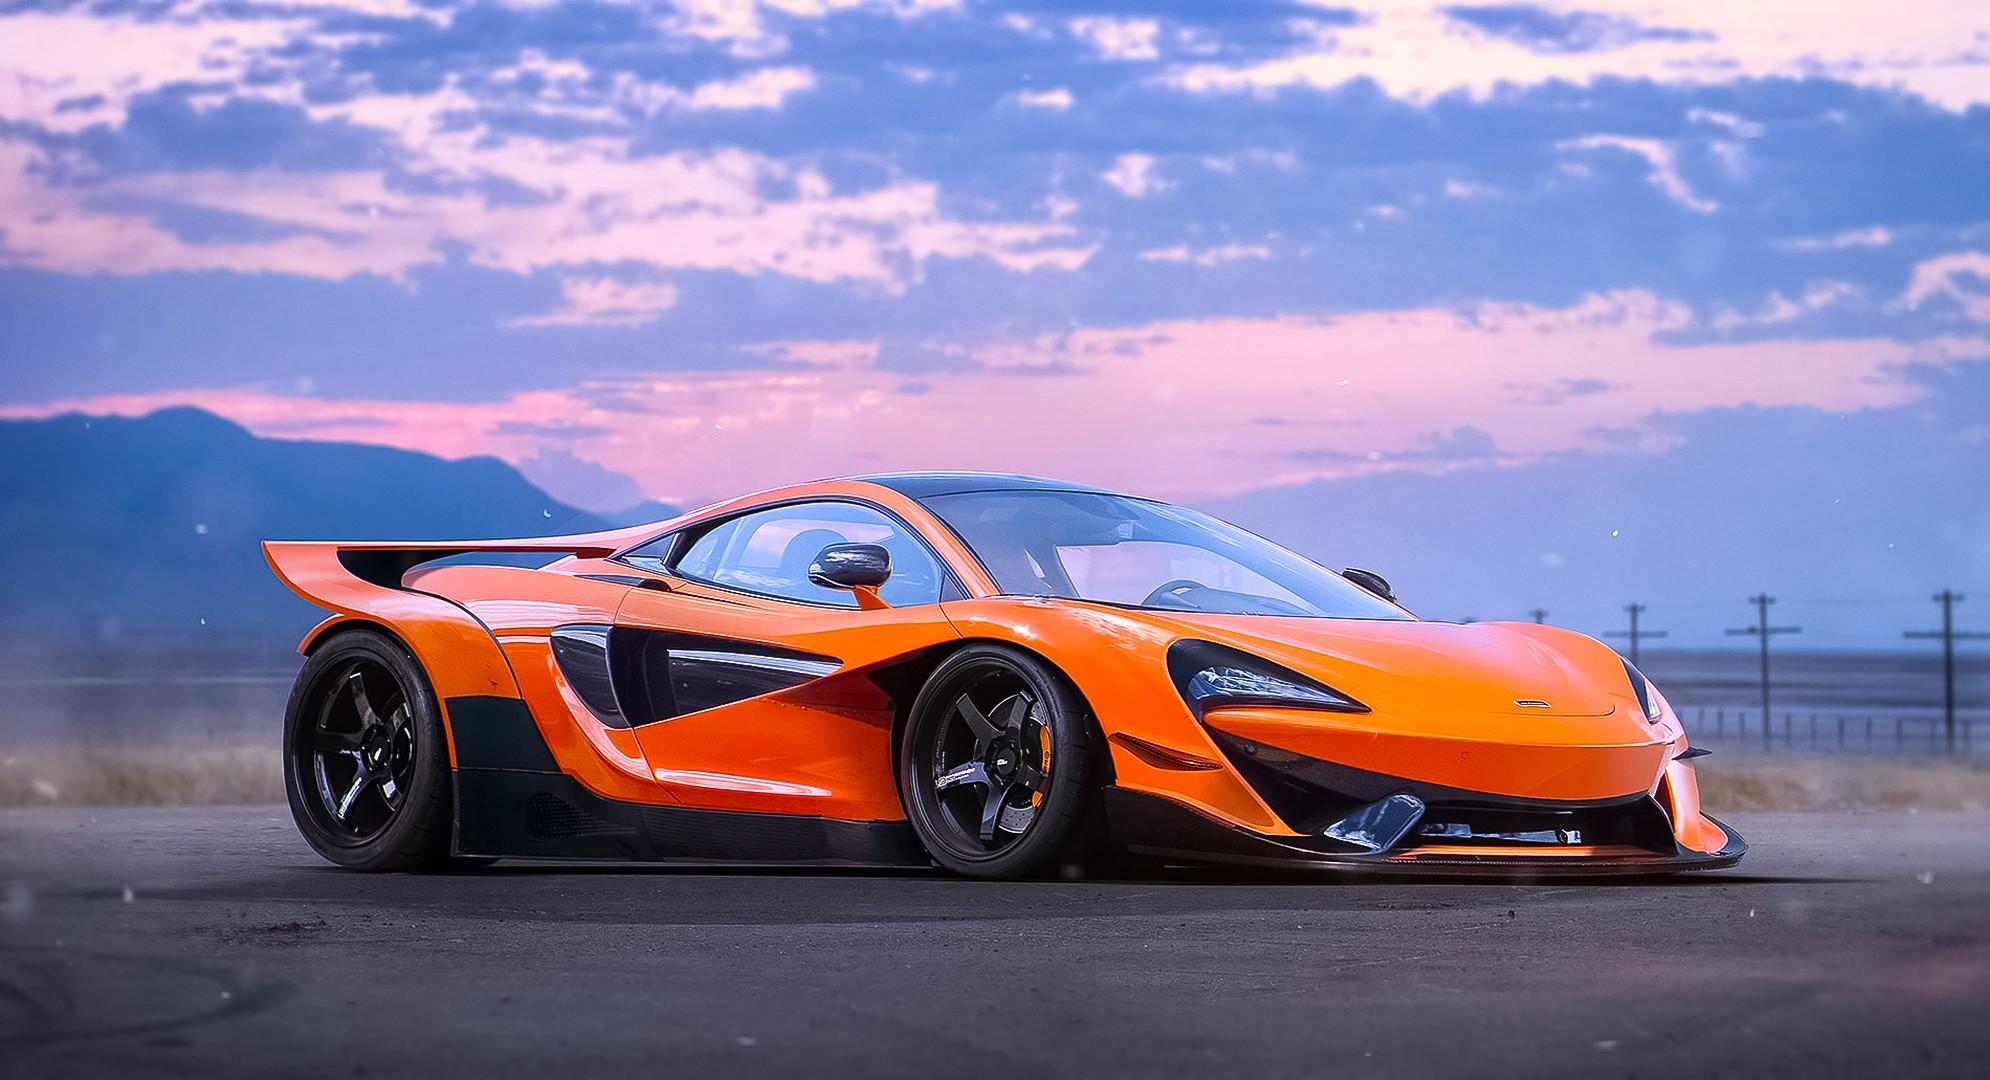 Dope Wallpaper Super Cars Super Car Vehicle Car Mclaren 570s Mclaren Wallpapers